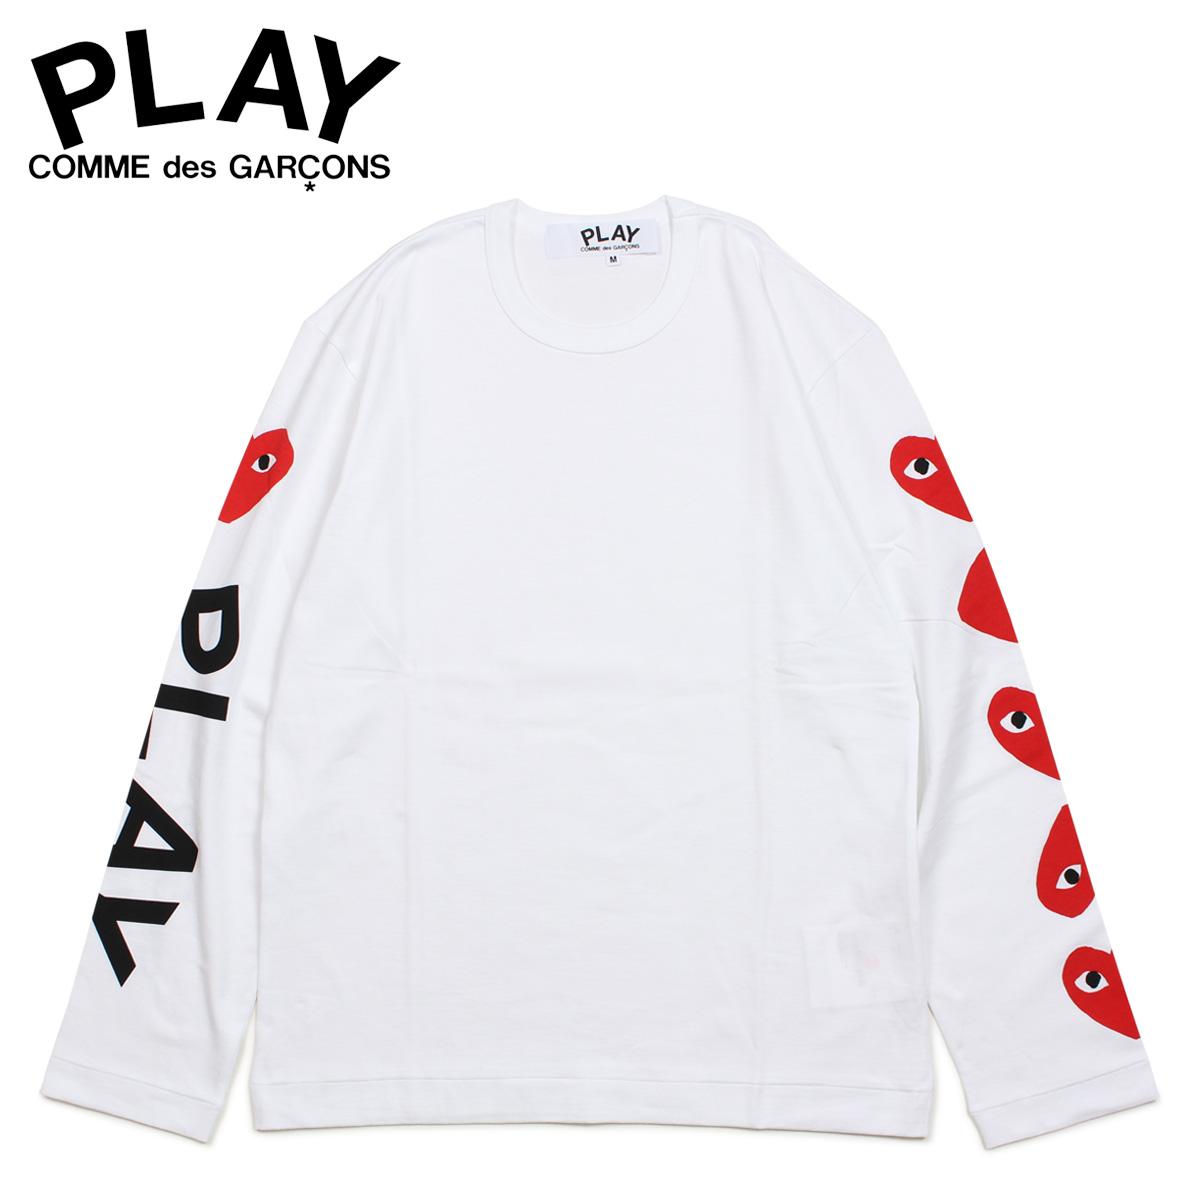 PLAY COMME des GARCONS コムデギャルソン Tシャツ メンズ 長袖 ロンT RED HEART LONG SLEEVE ホワイト 白 AZ-T262 [4/1 新入荷]